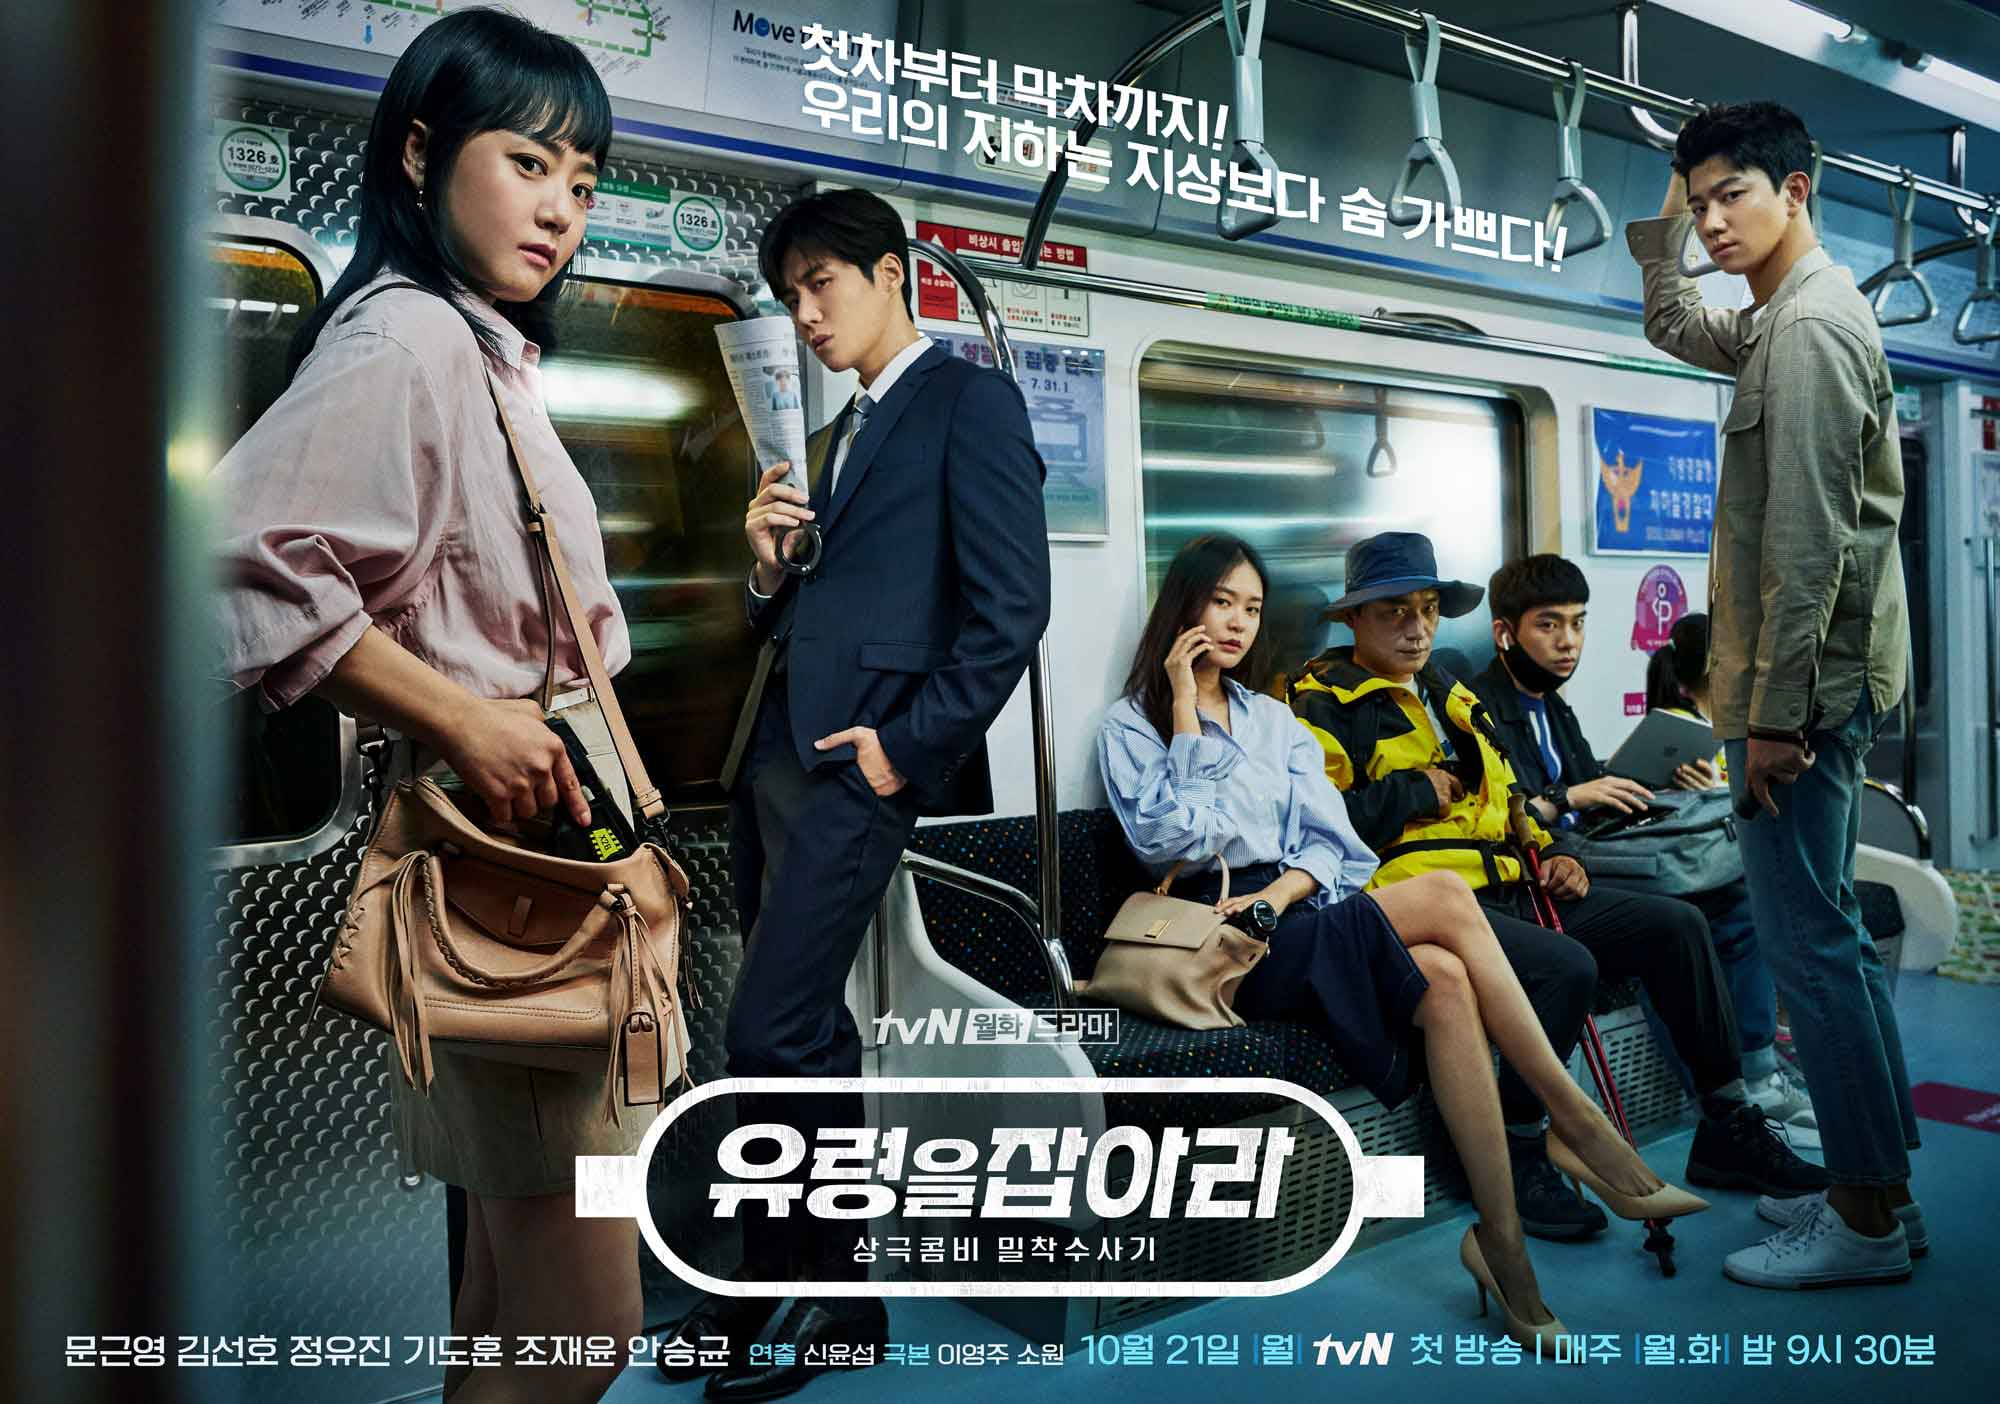 Catch Yoo Ryung